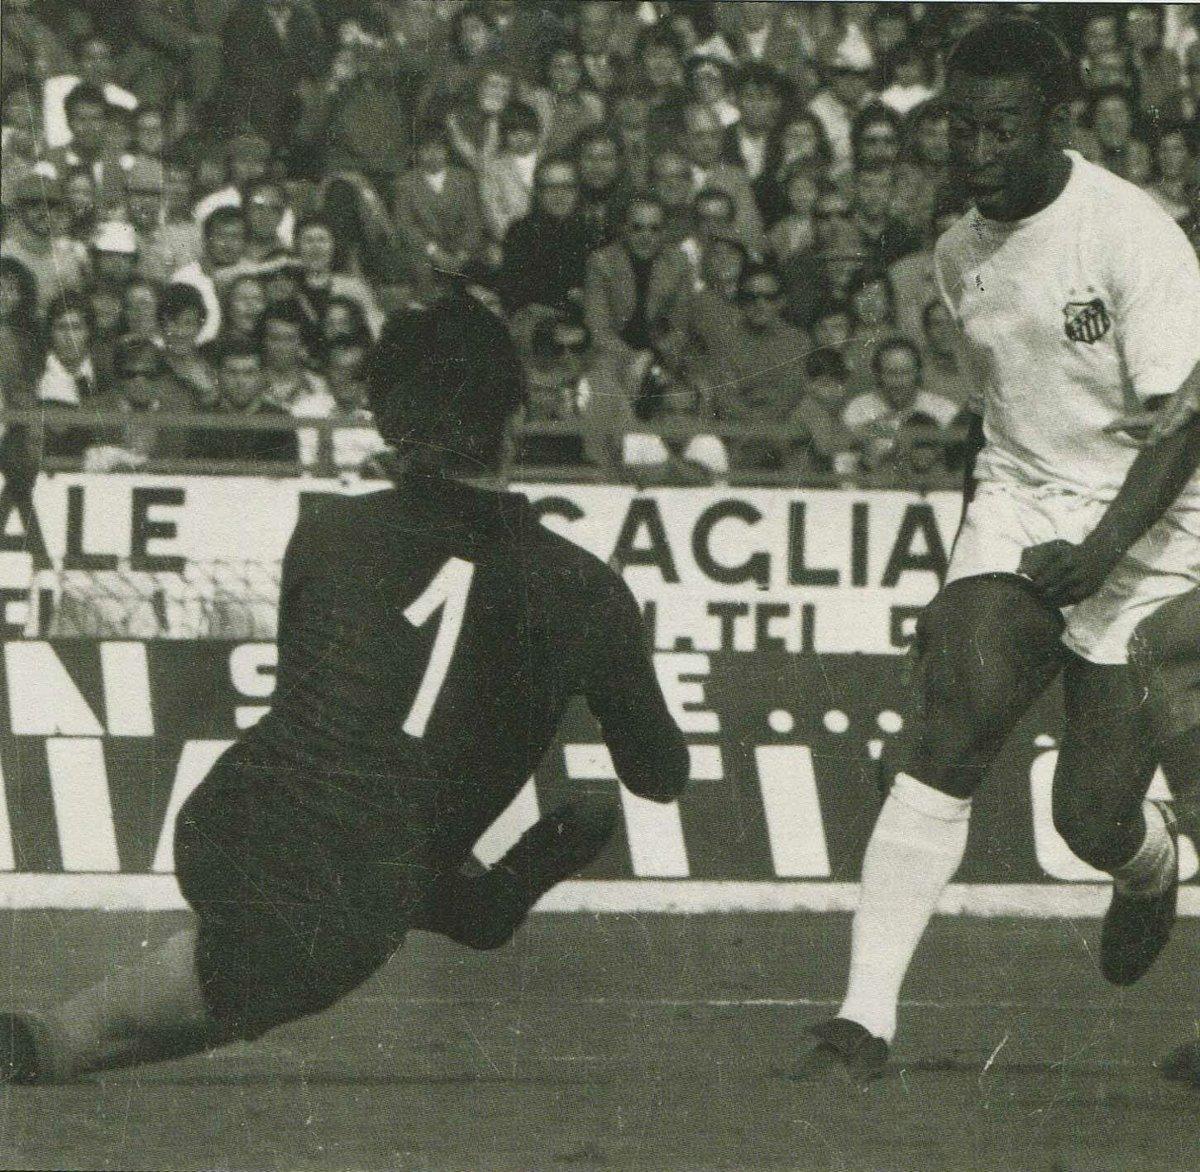 #Cagliari 2-3 #Santos (1972) Goalkeeper #EnricoAlbertosi and #Pelé<br>http://pic.twitter.com/qTFB9Jz6FJ